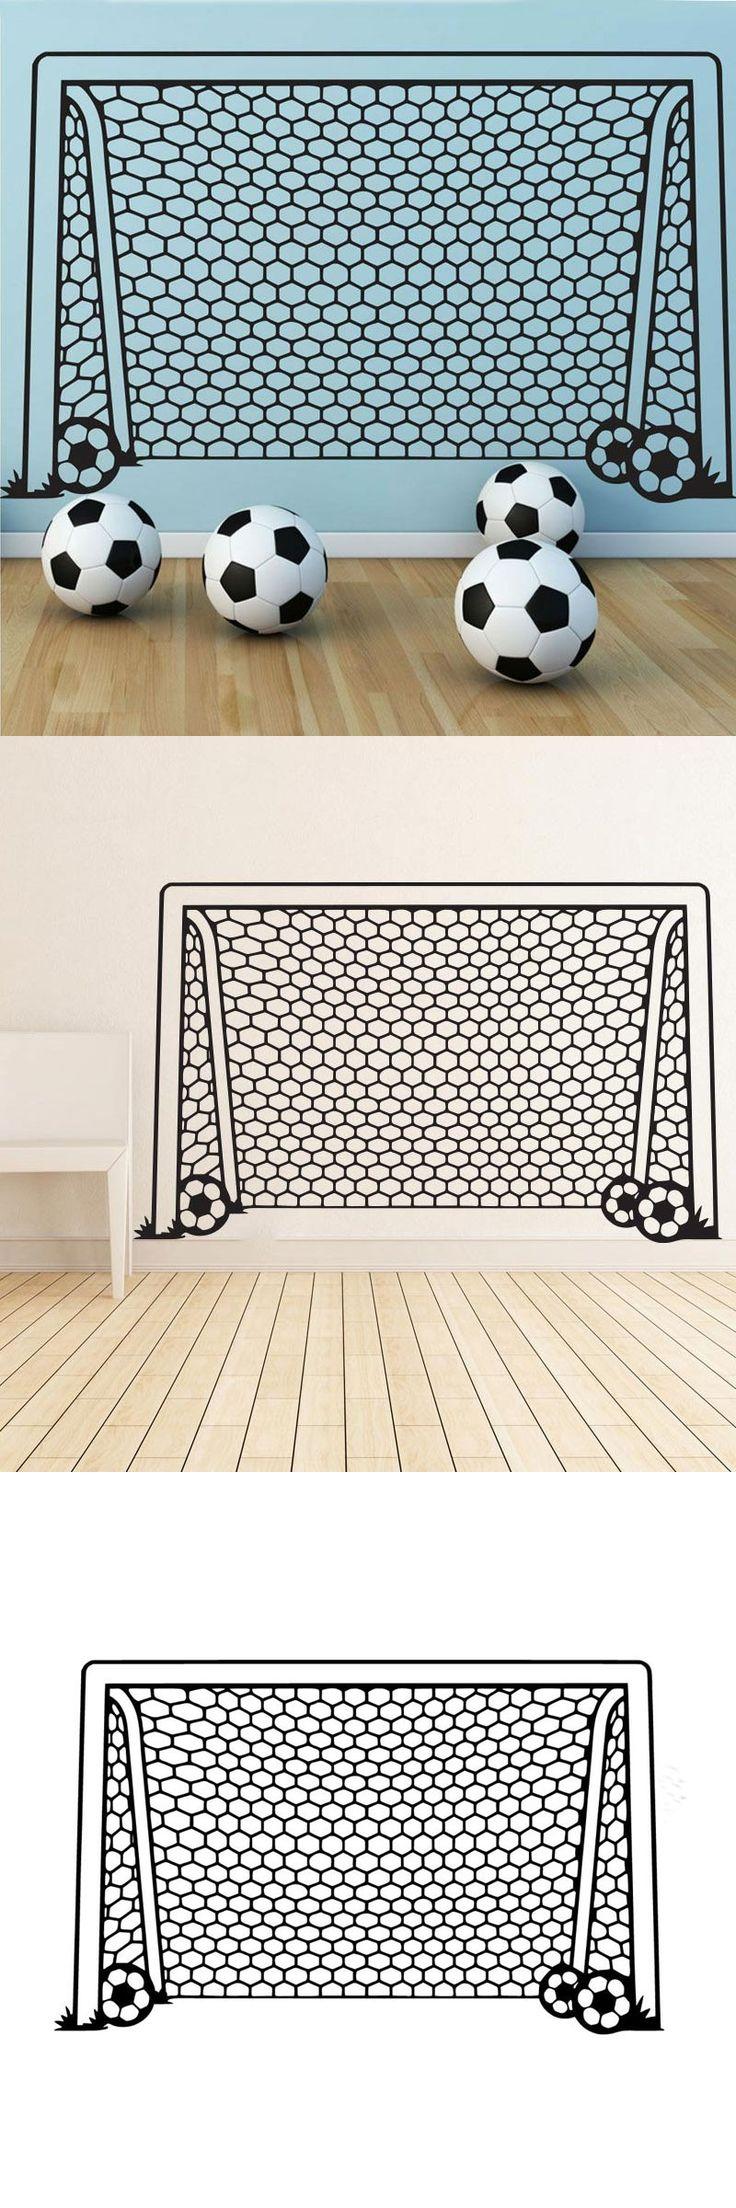 Soccer Net Sport Soccer Wall Stickers Home Decor Kids Bedroom Wall Vinyl Stickers Nursery Wall Decals